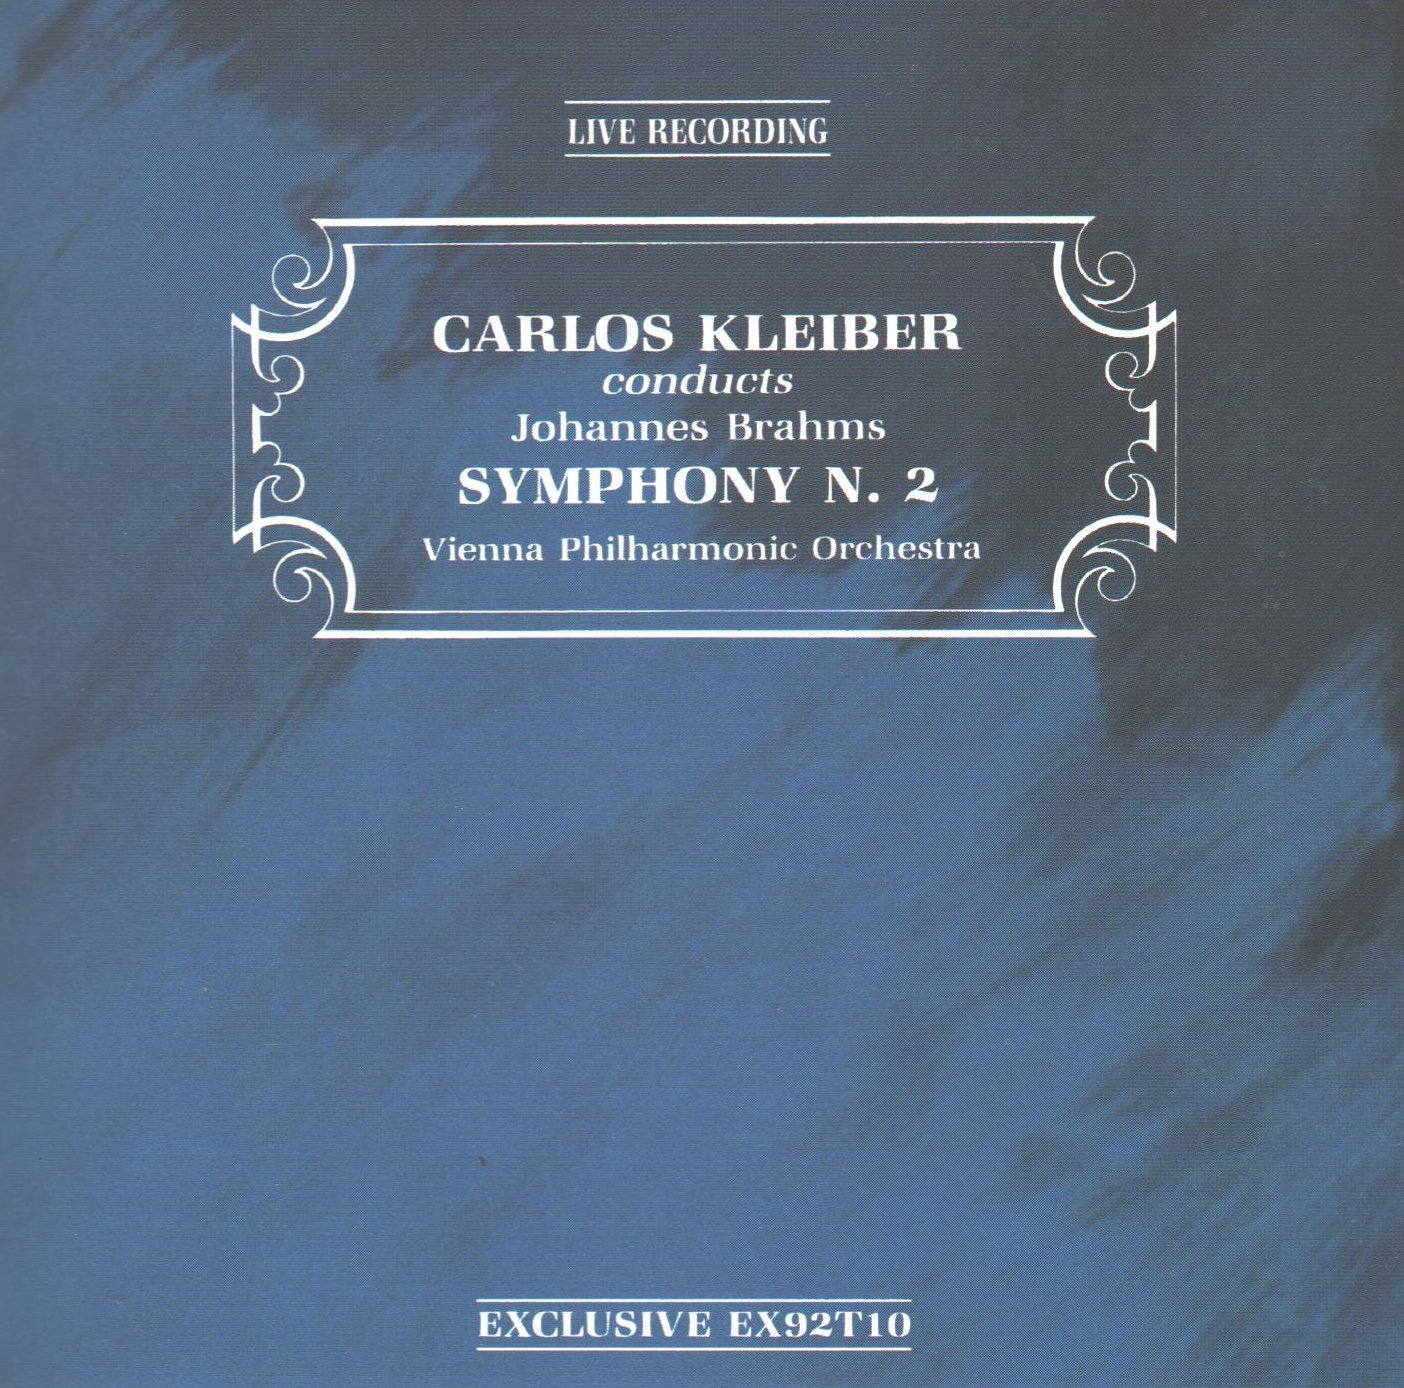 Symphony 2                                                                                                                                                                                                                                                    <span class=